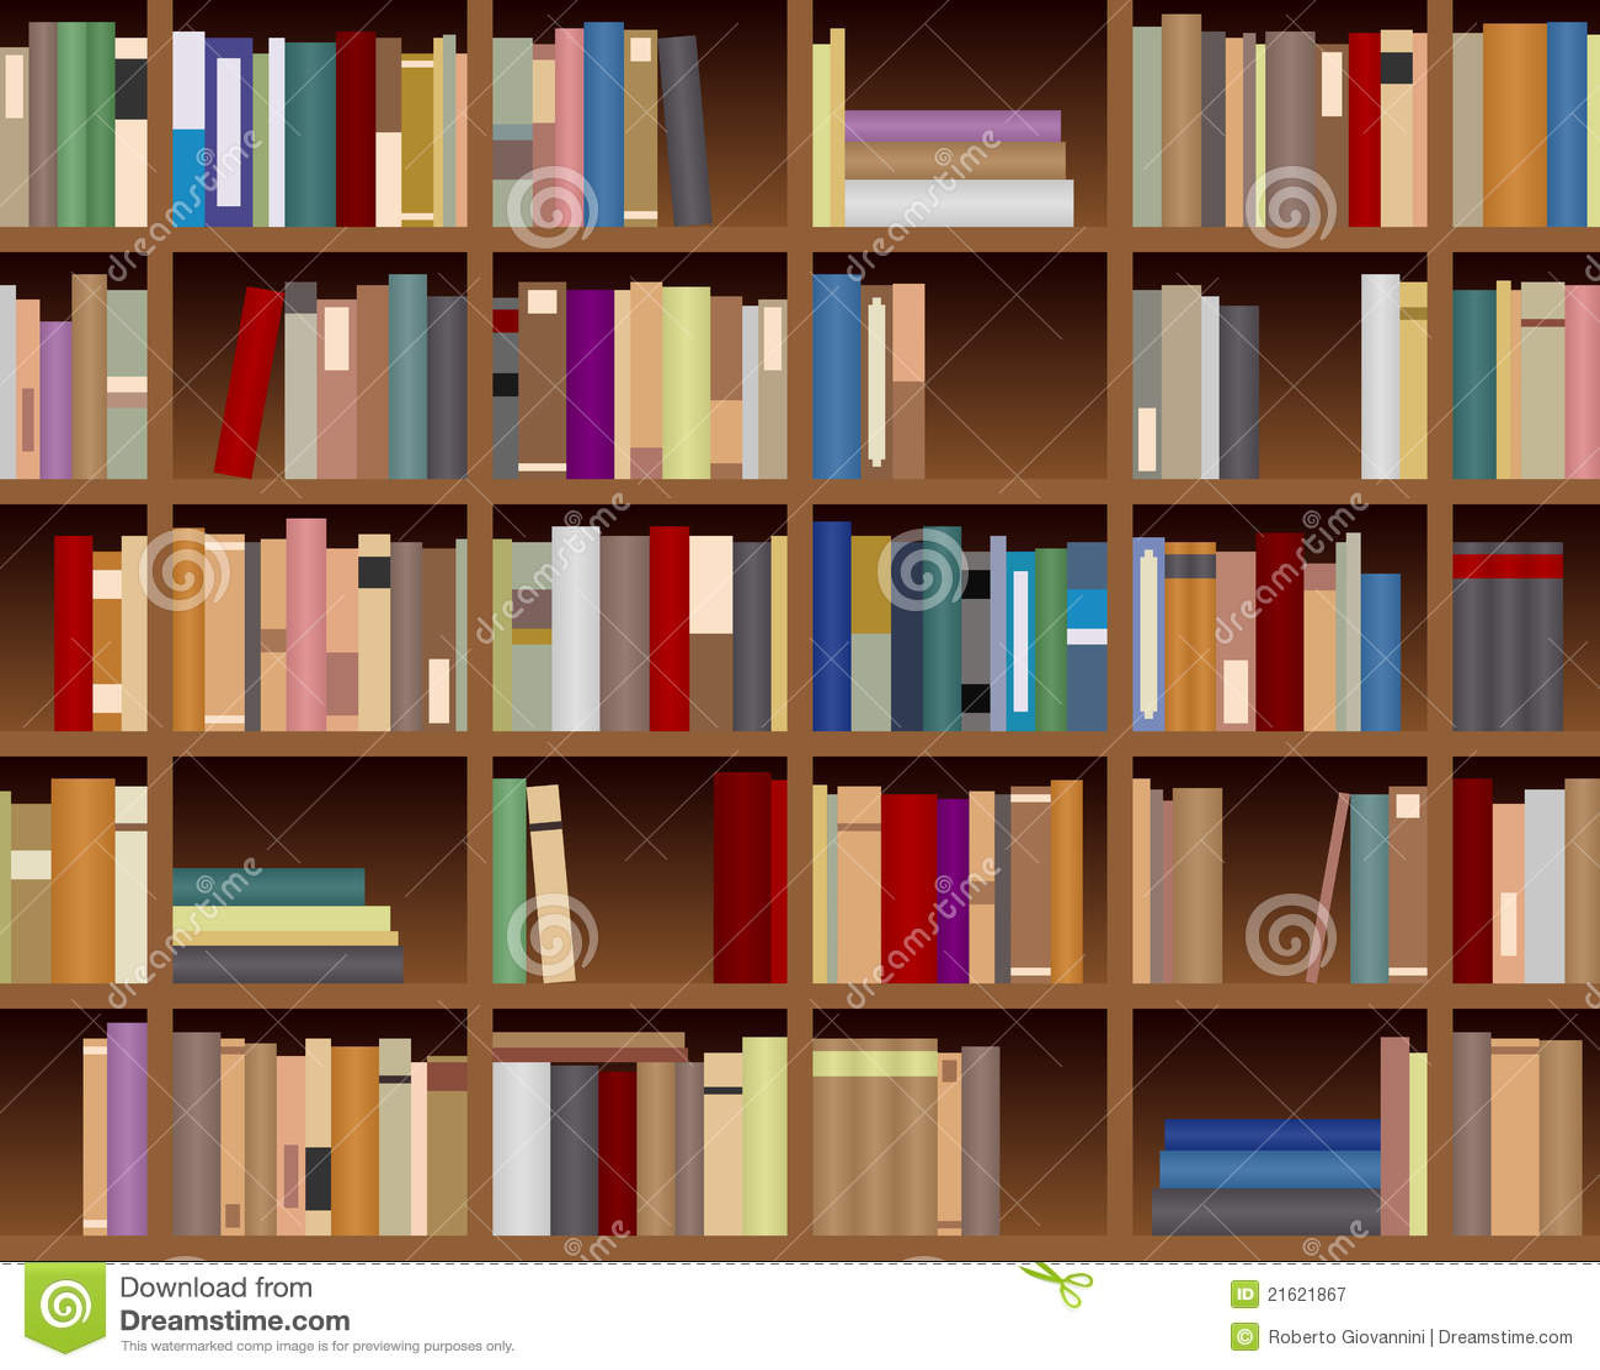 Fondo incons til del estante para libros fotograf a de - Estantes para libros ...